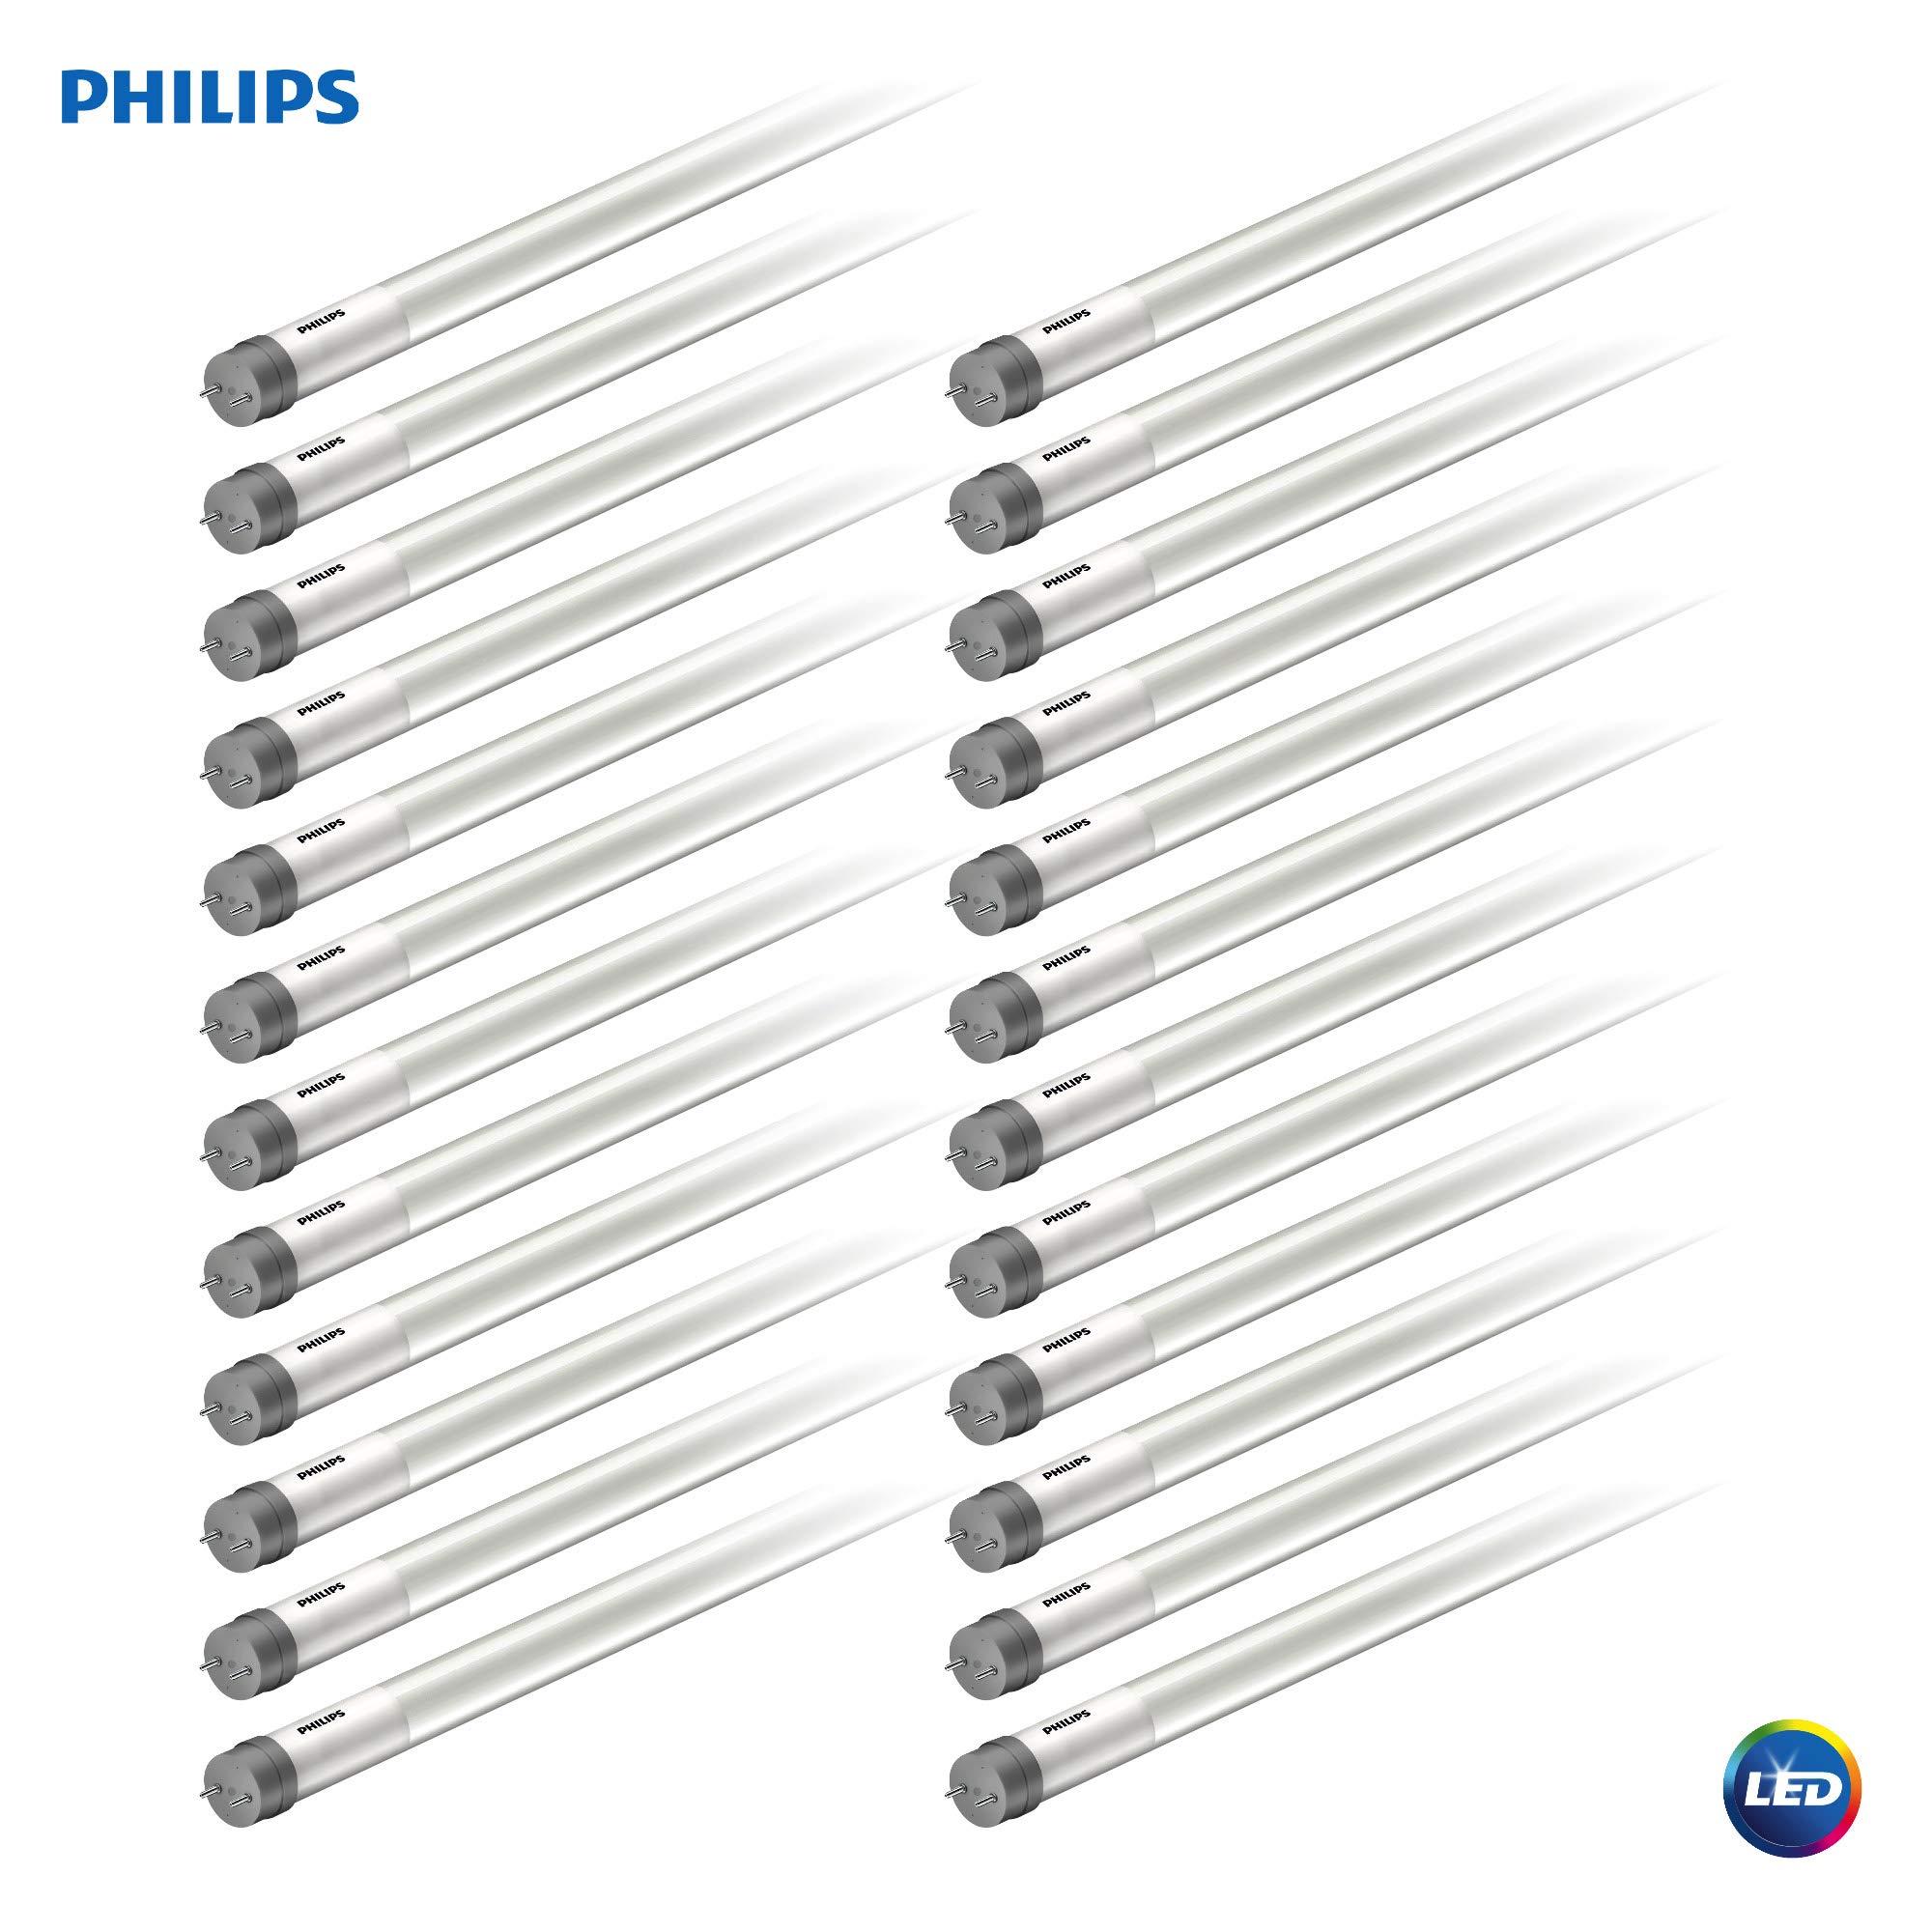 Philips LED MainsFit Ballast Bypass 4-Foot T8 Tube Glass Light Bulb: 1800-Lumen, 5000-Kelvin, 14 (32-Watt Equivalent), Medium Bi-Pin G13 Base, Frosted, Daylight, 24 Pack, 544197, 5000 Kelvin, Piece